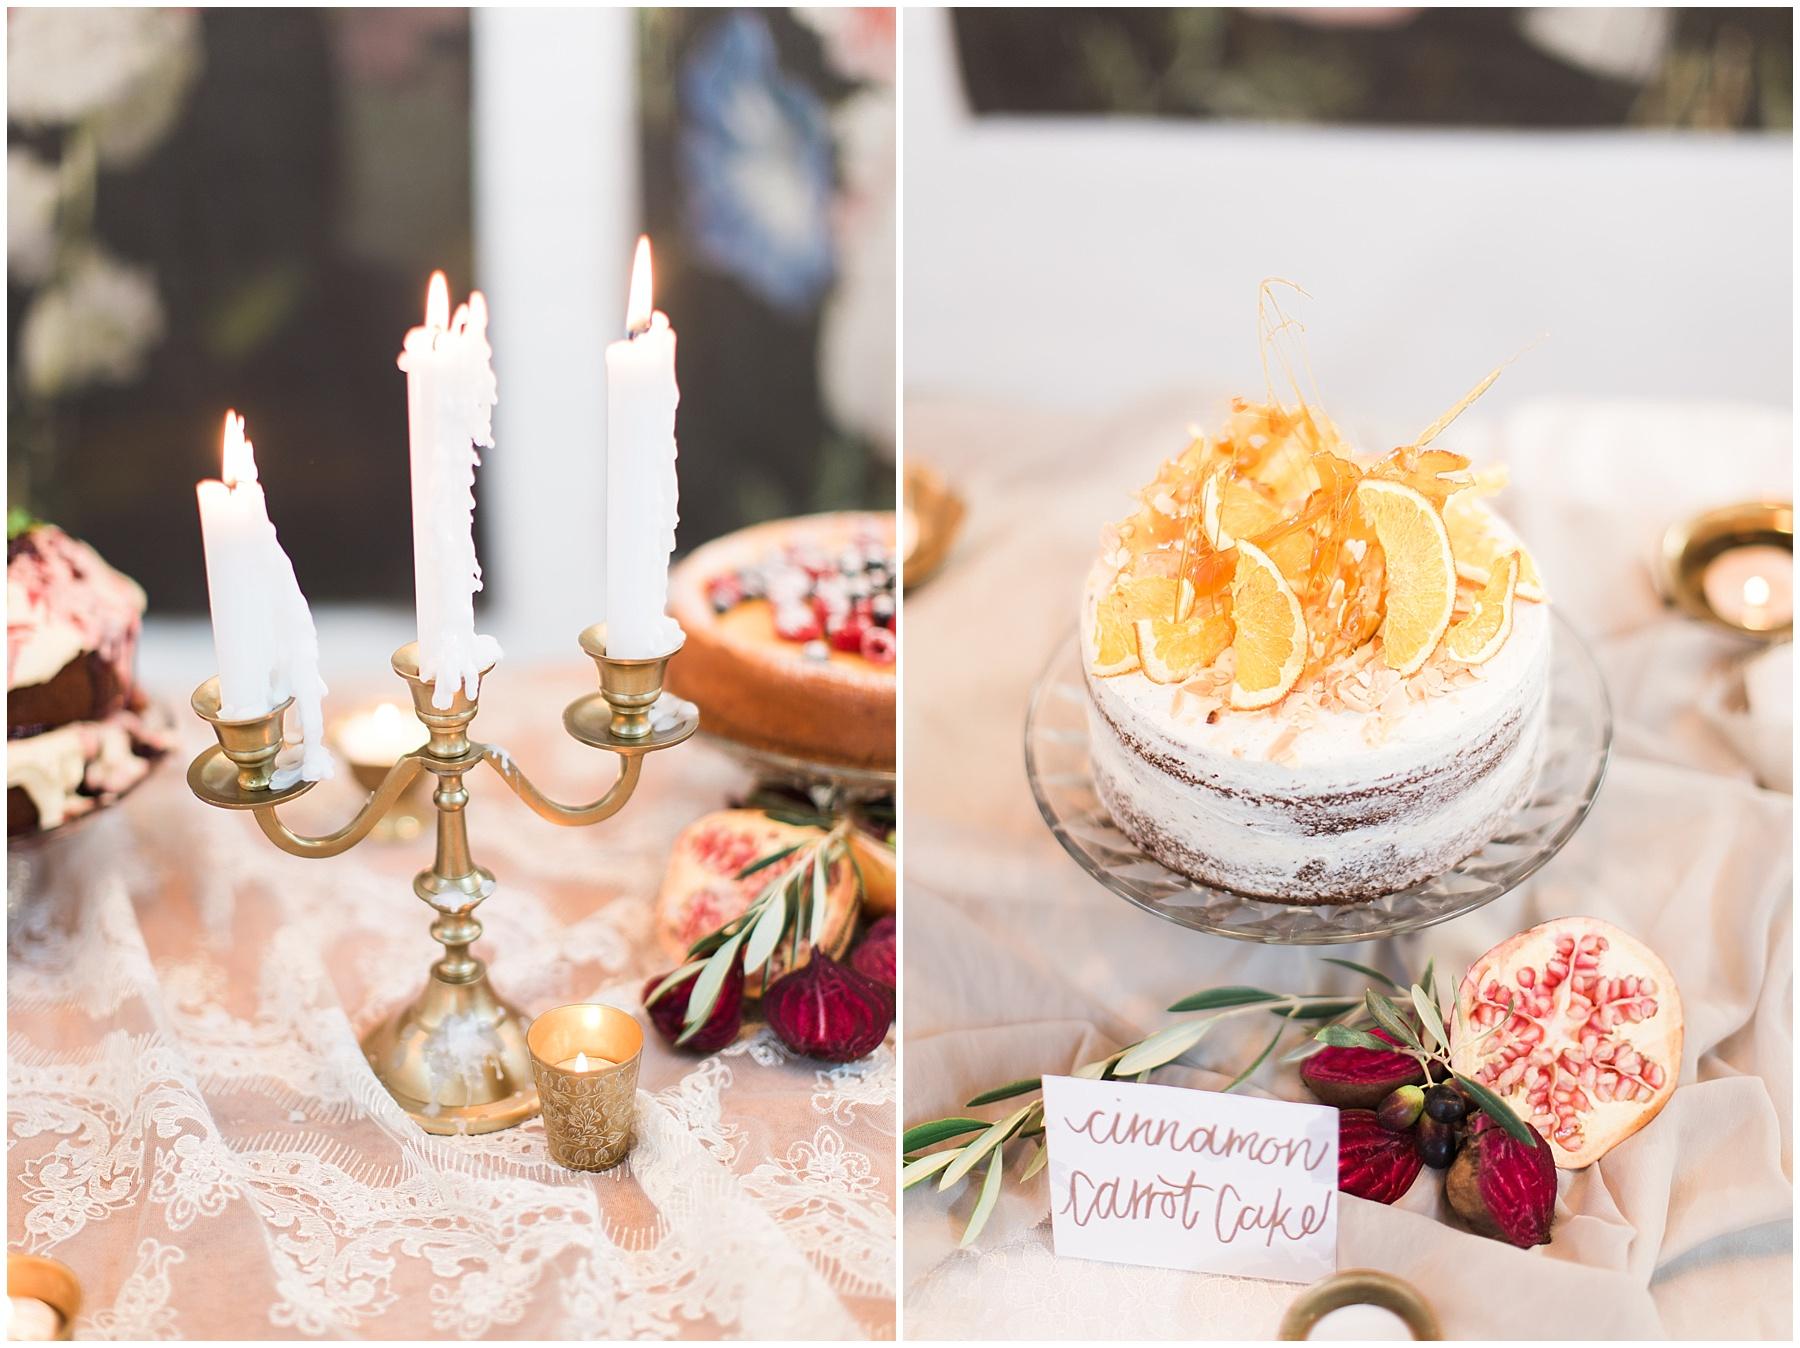 AliciaLandman_JoleneandZander_Wedding_The Pretty Blog_0416.jpg